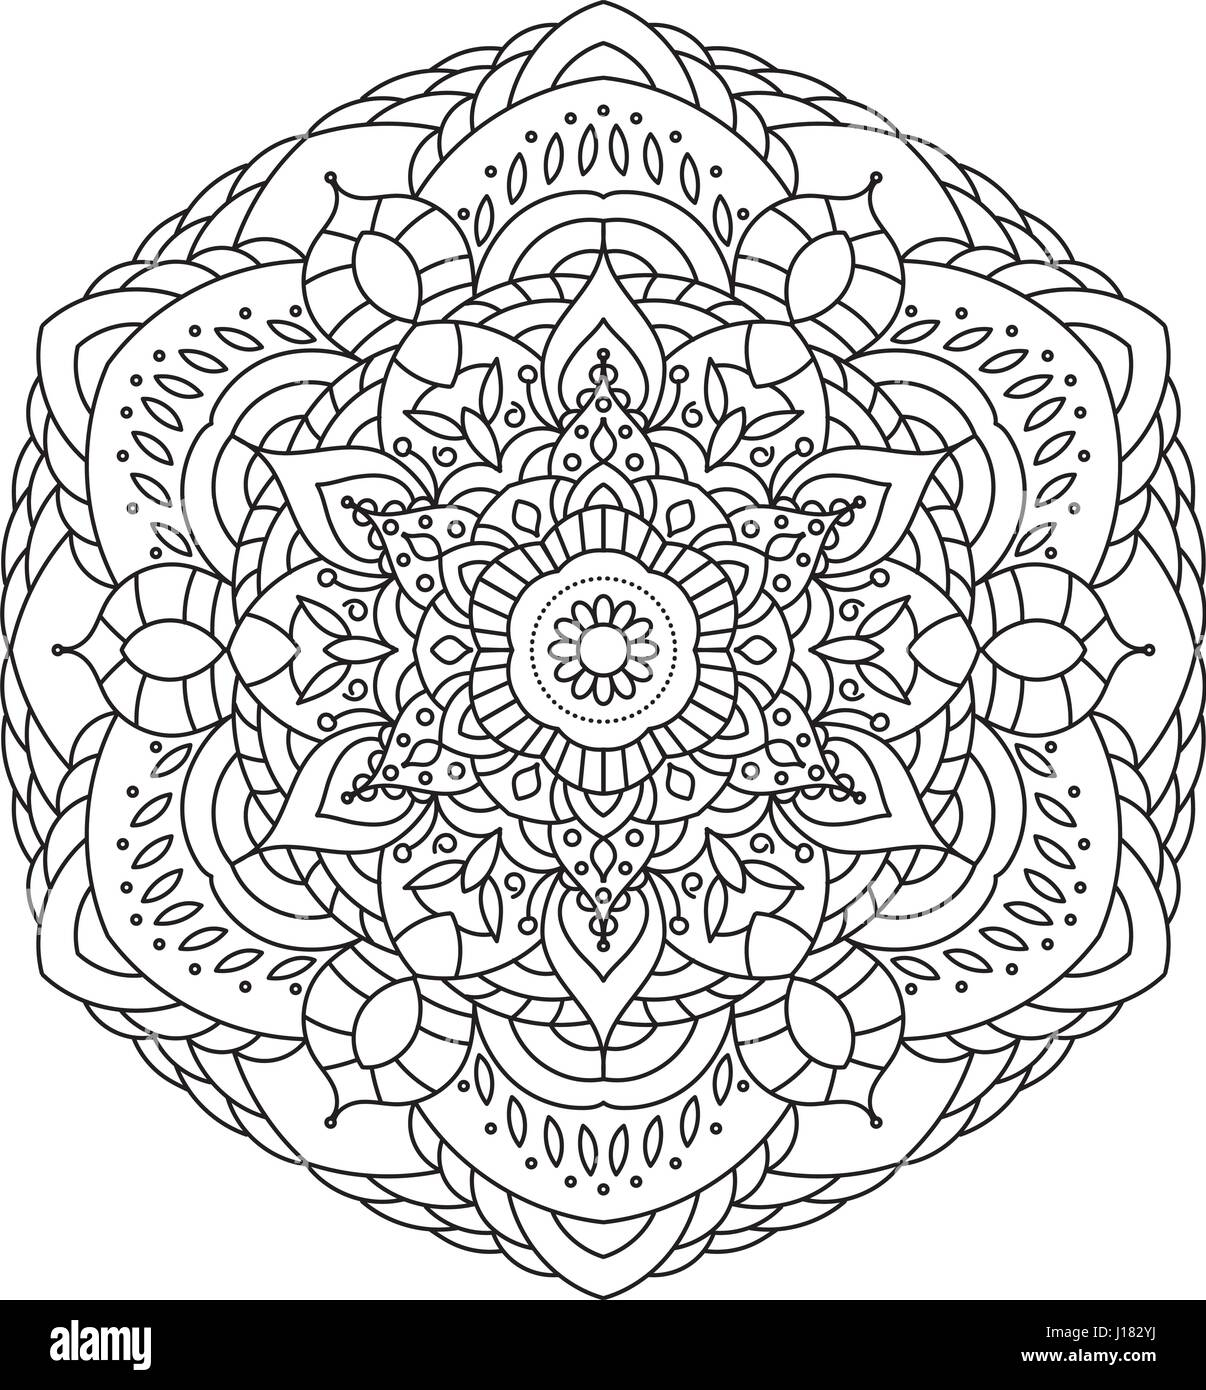 Coloring Book Mandala. Circle lace ornament, round ornamental ...